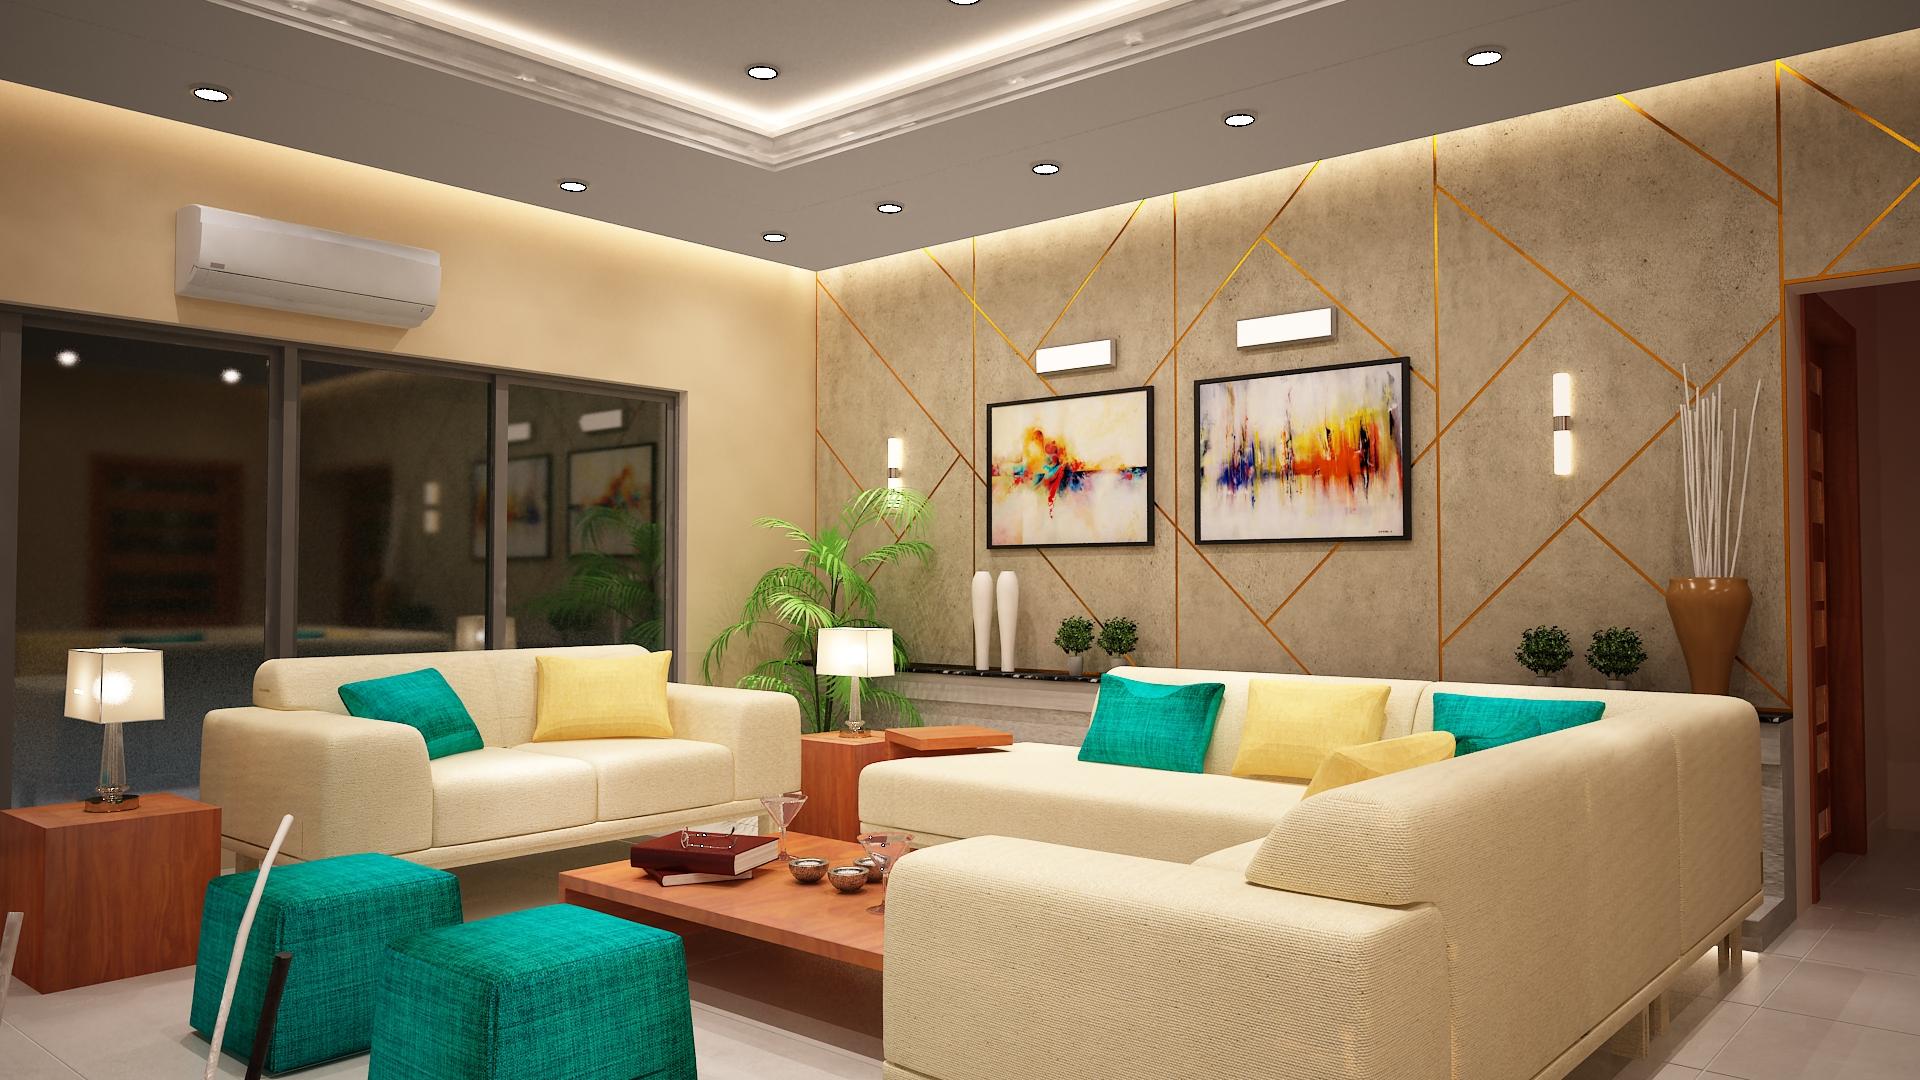 Mr.Qasim Residence - Sadia and Ammar Associates